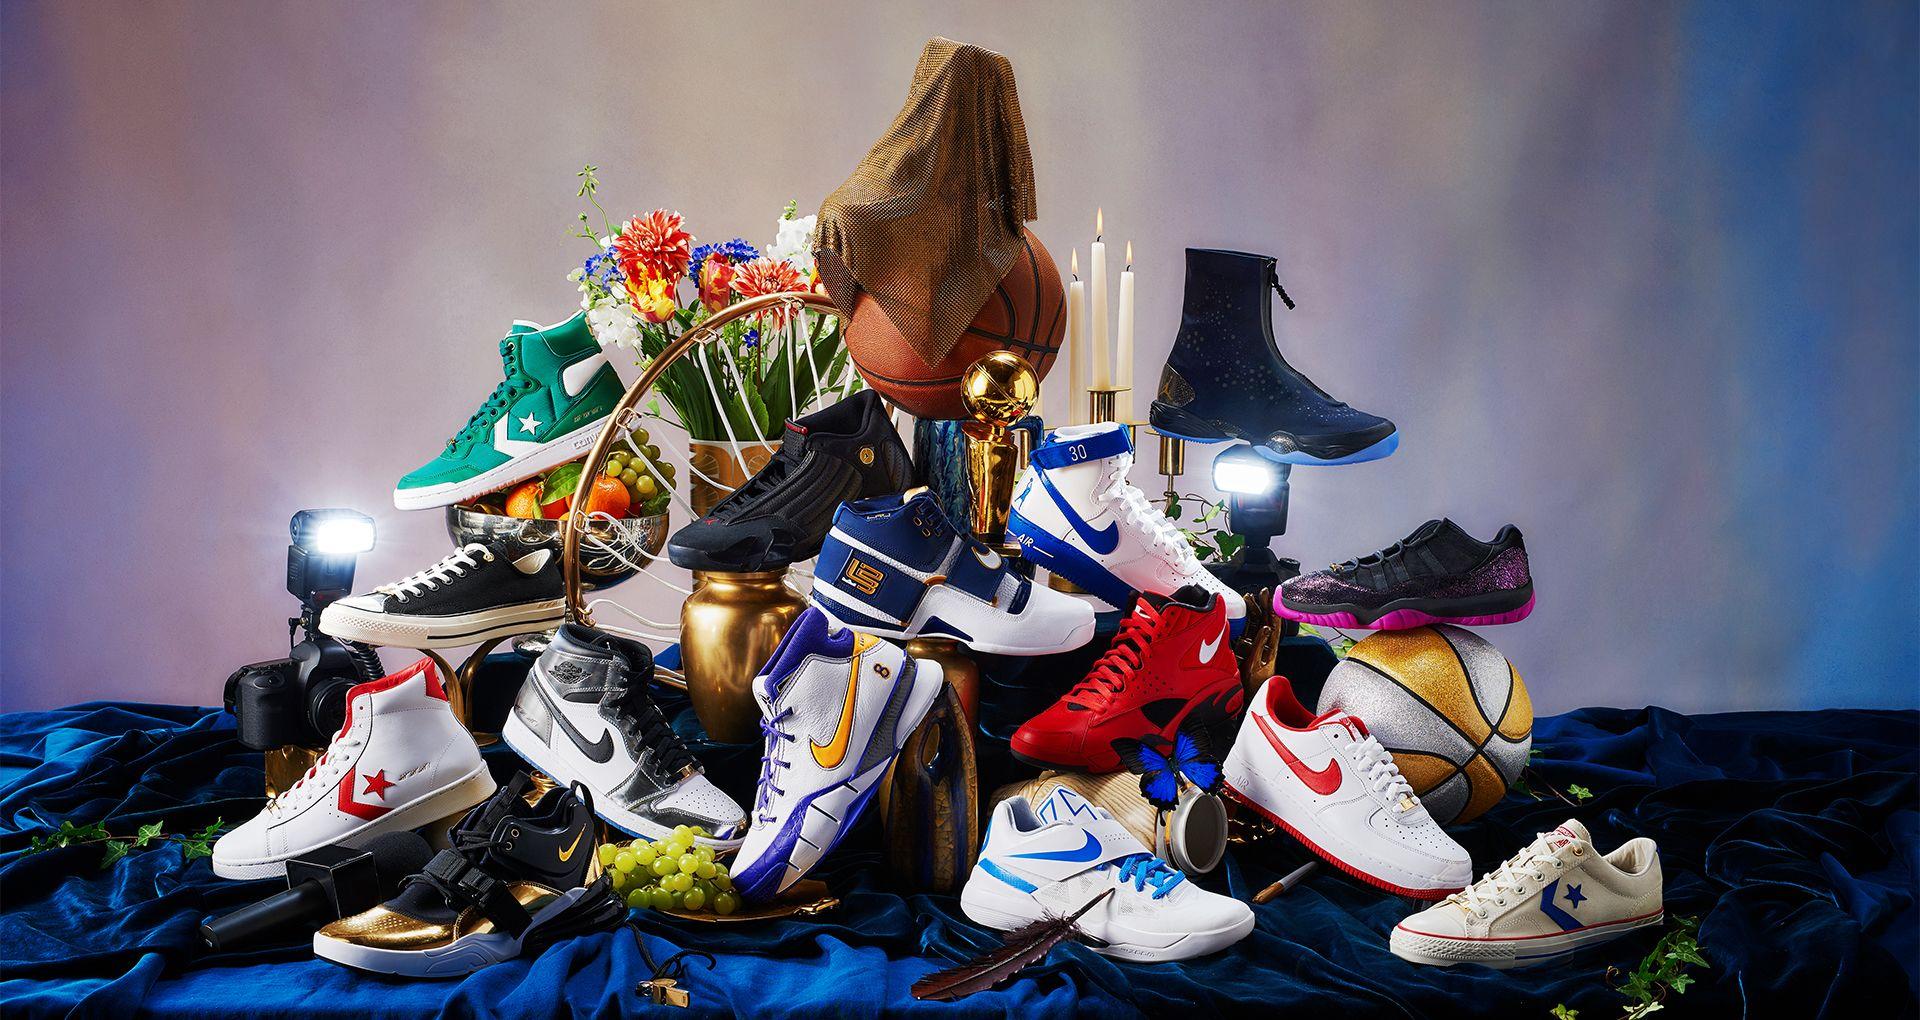 Nike Of A ChampionNikeLaunch Collection Lu Art b6gf7y